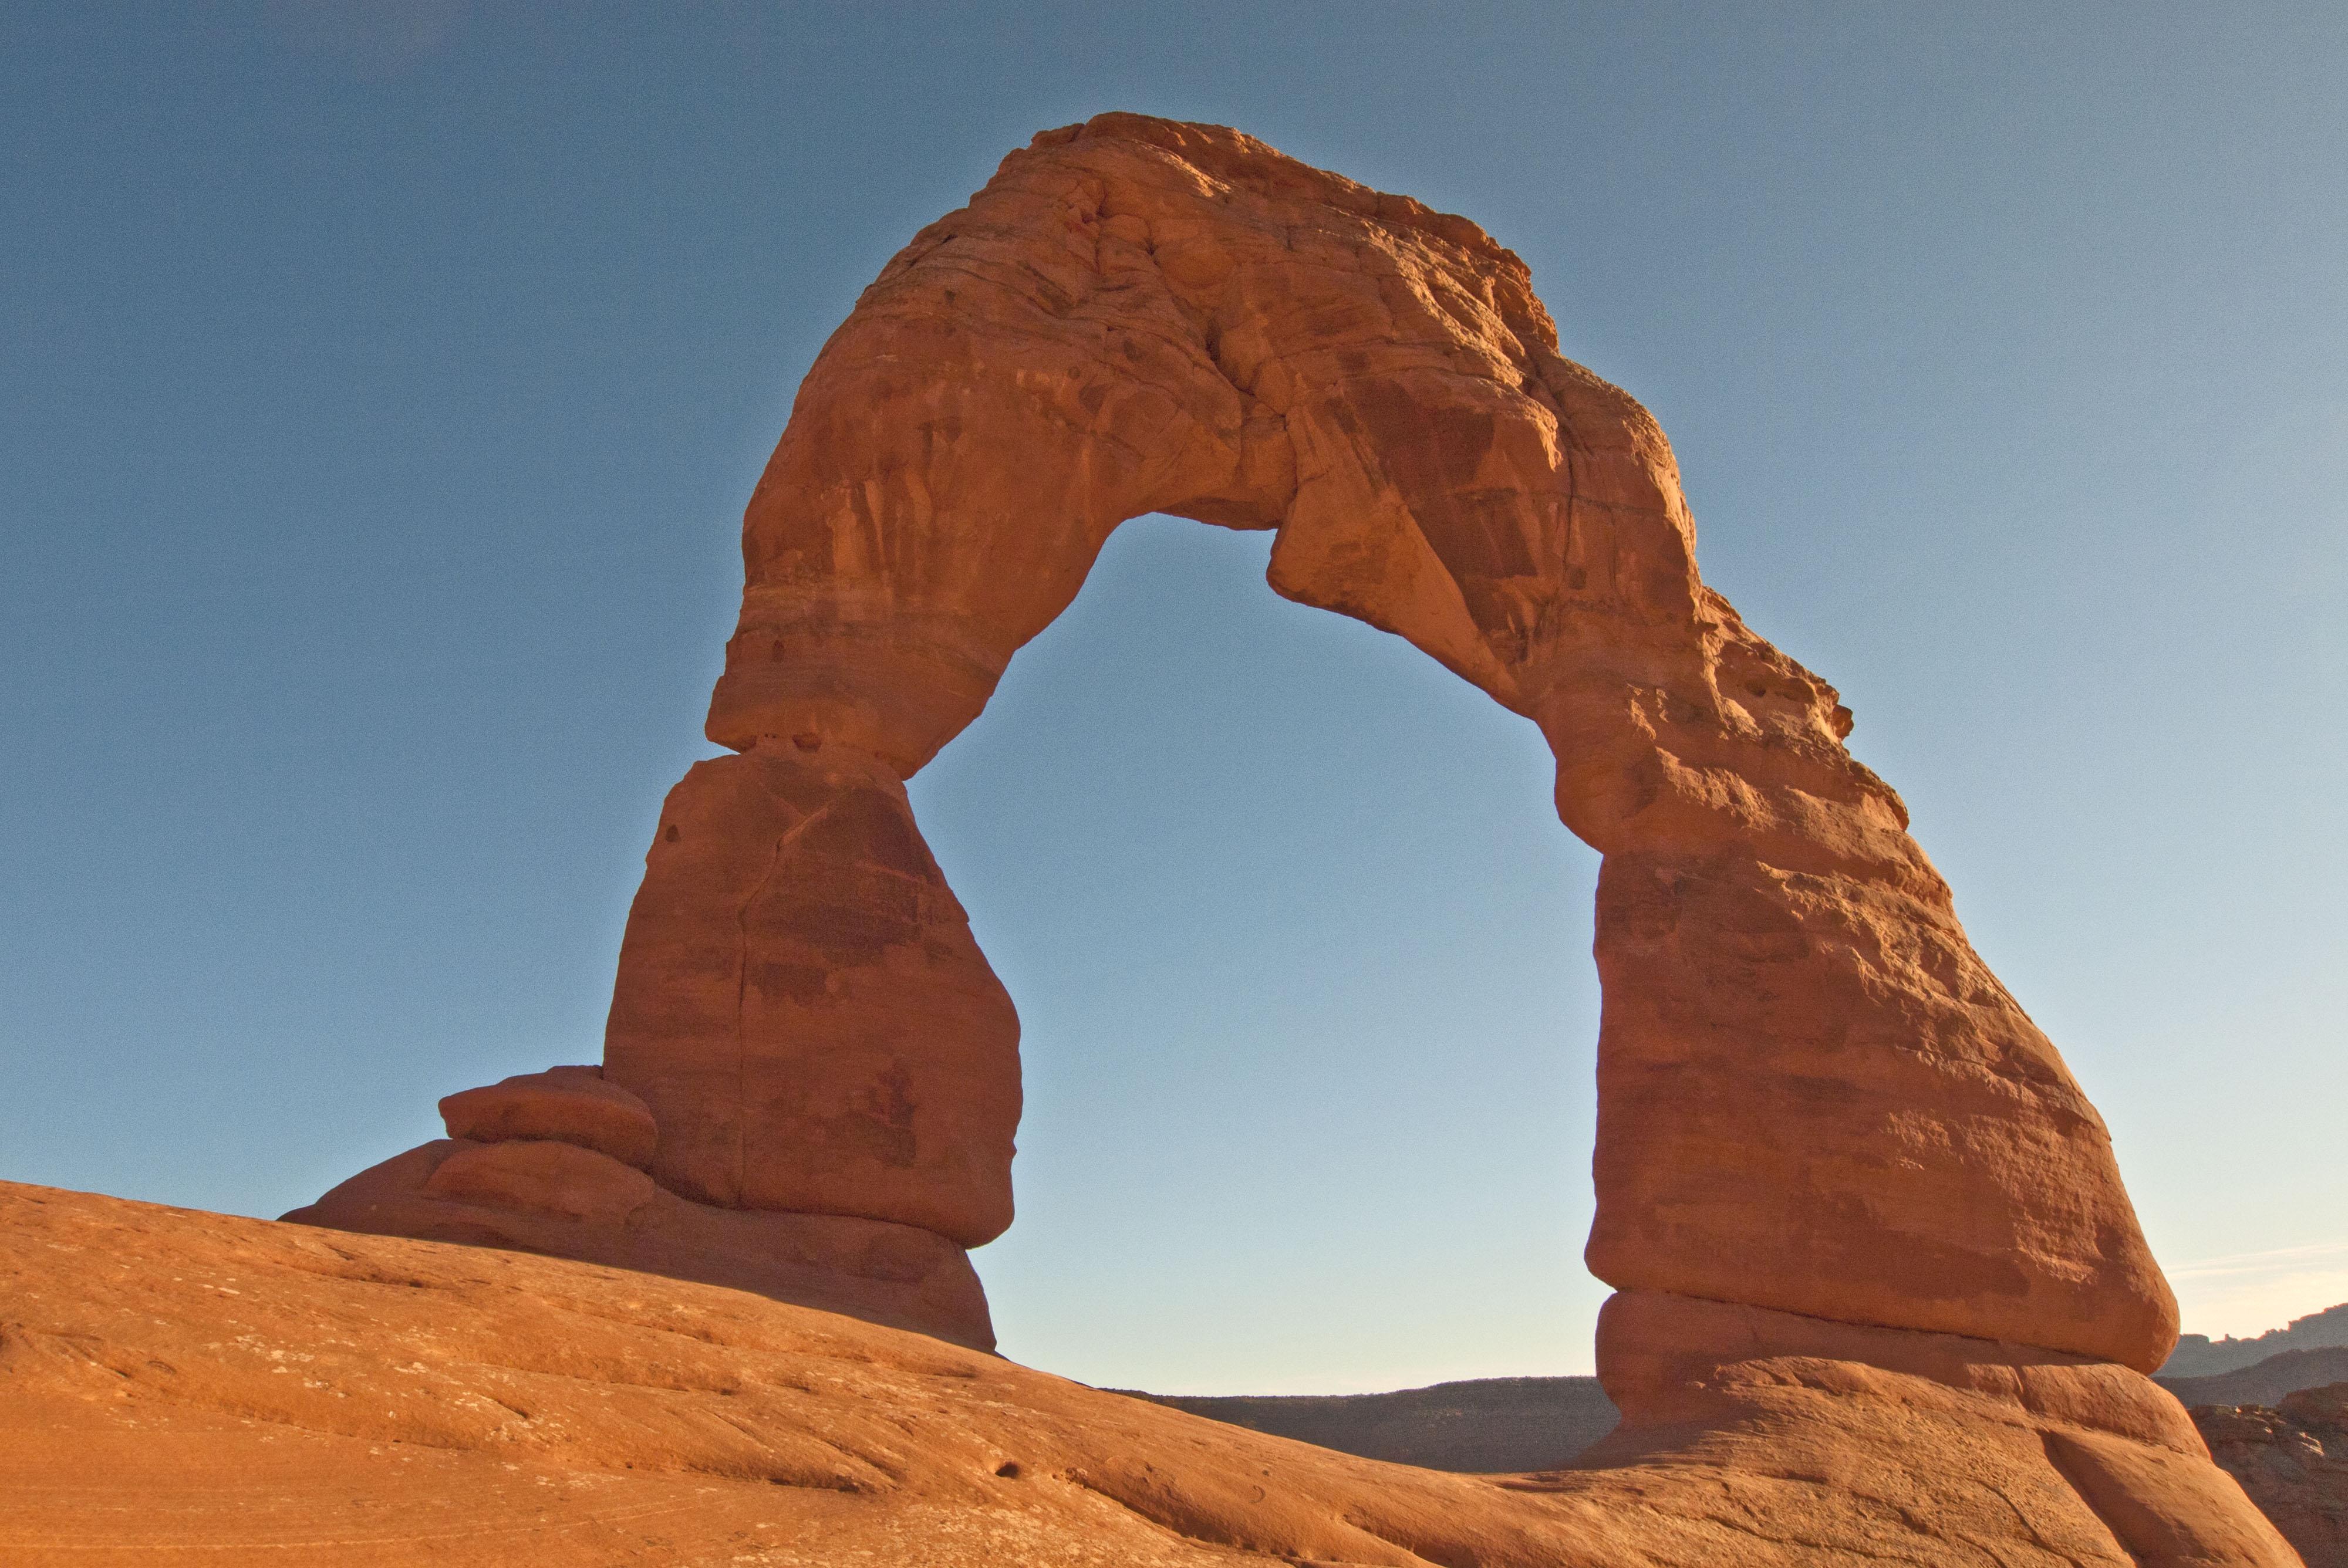 Arches National Park Fromalaskatobrazil